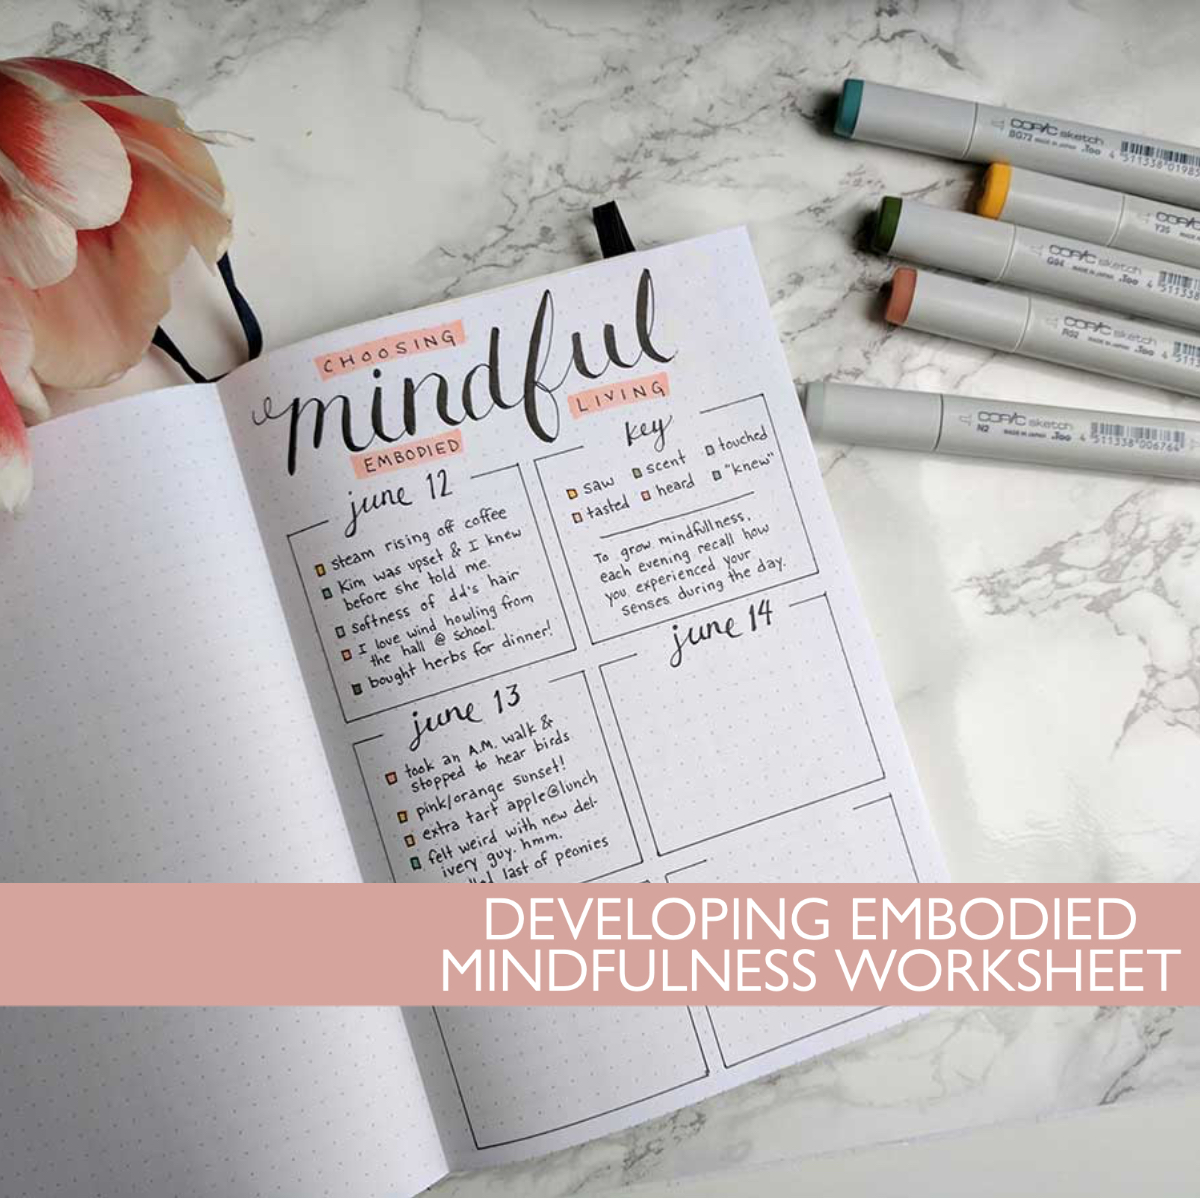 Developing embodied mindfulness worksheet